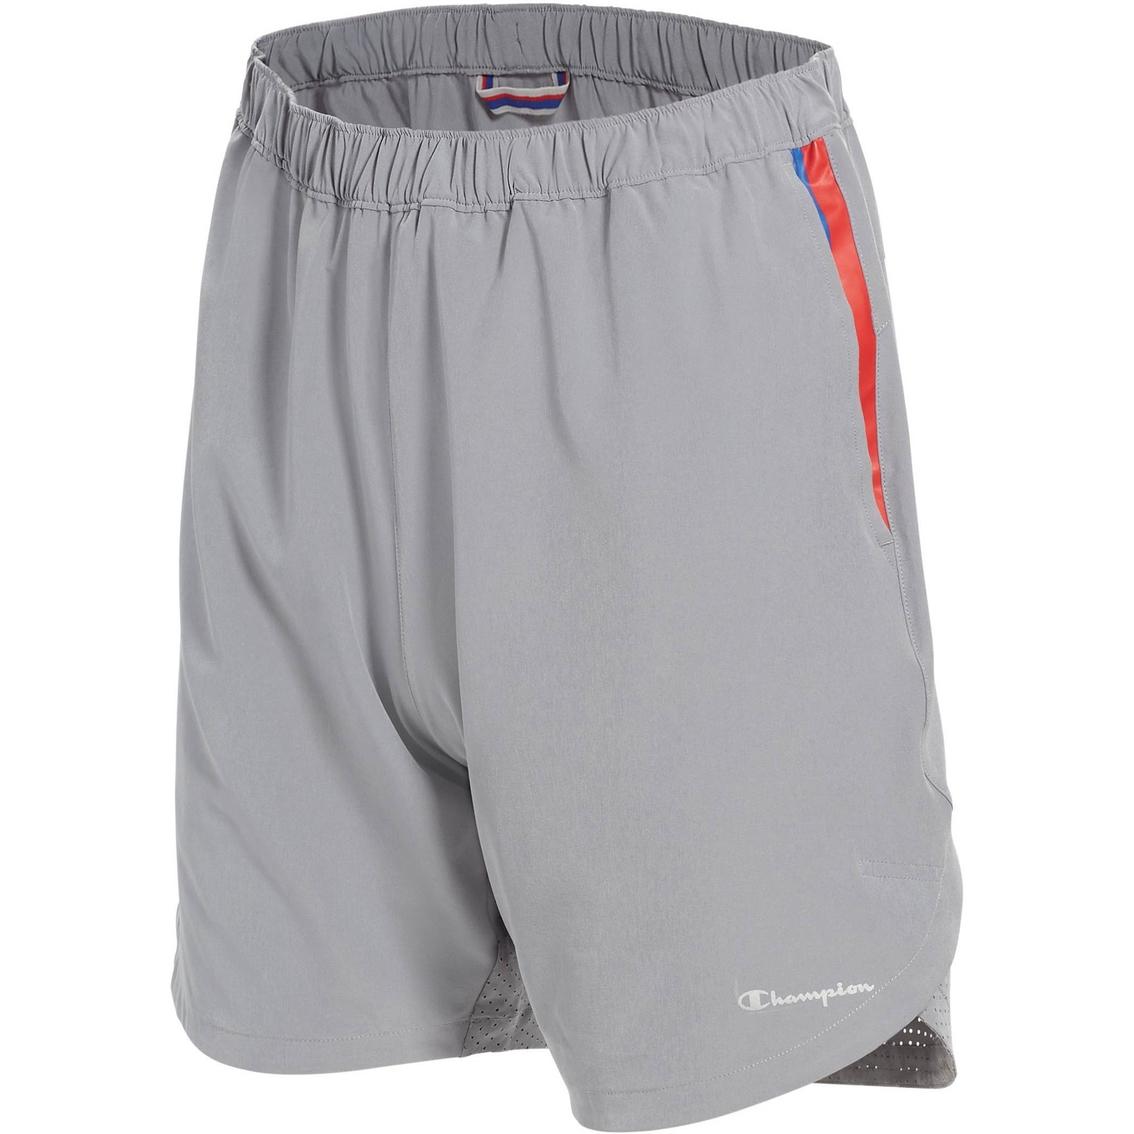 ba2486c36 Champion Phys. Ed. Shorts | Shorts | Father's Day Shop | Shop The ...